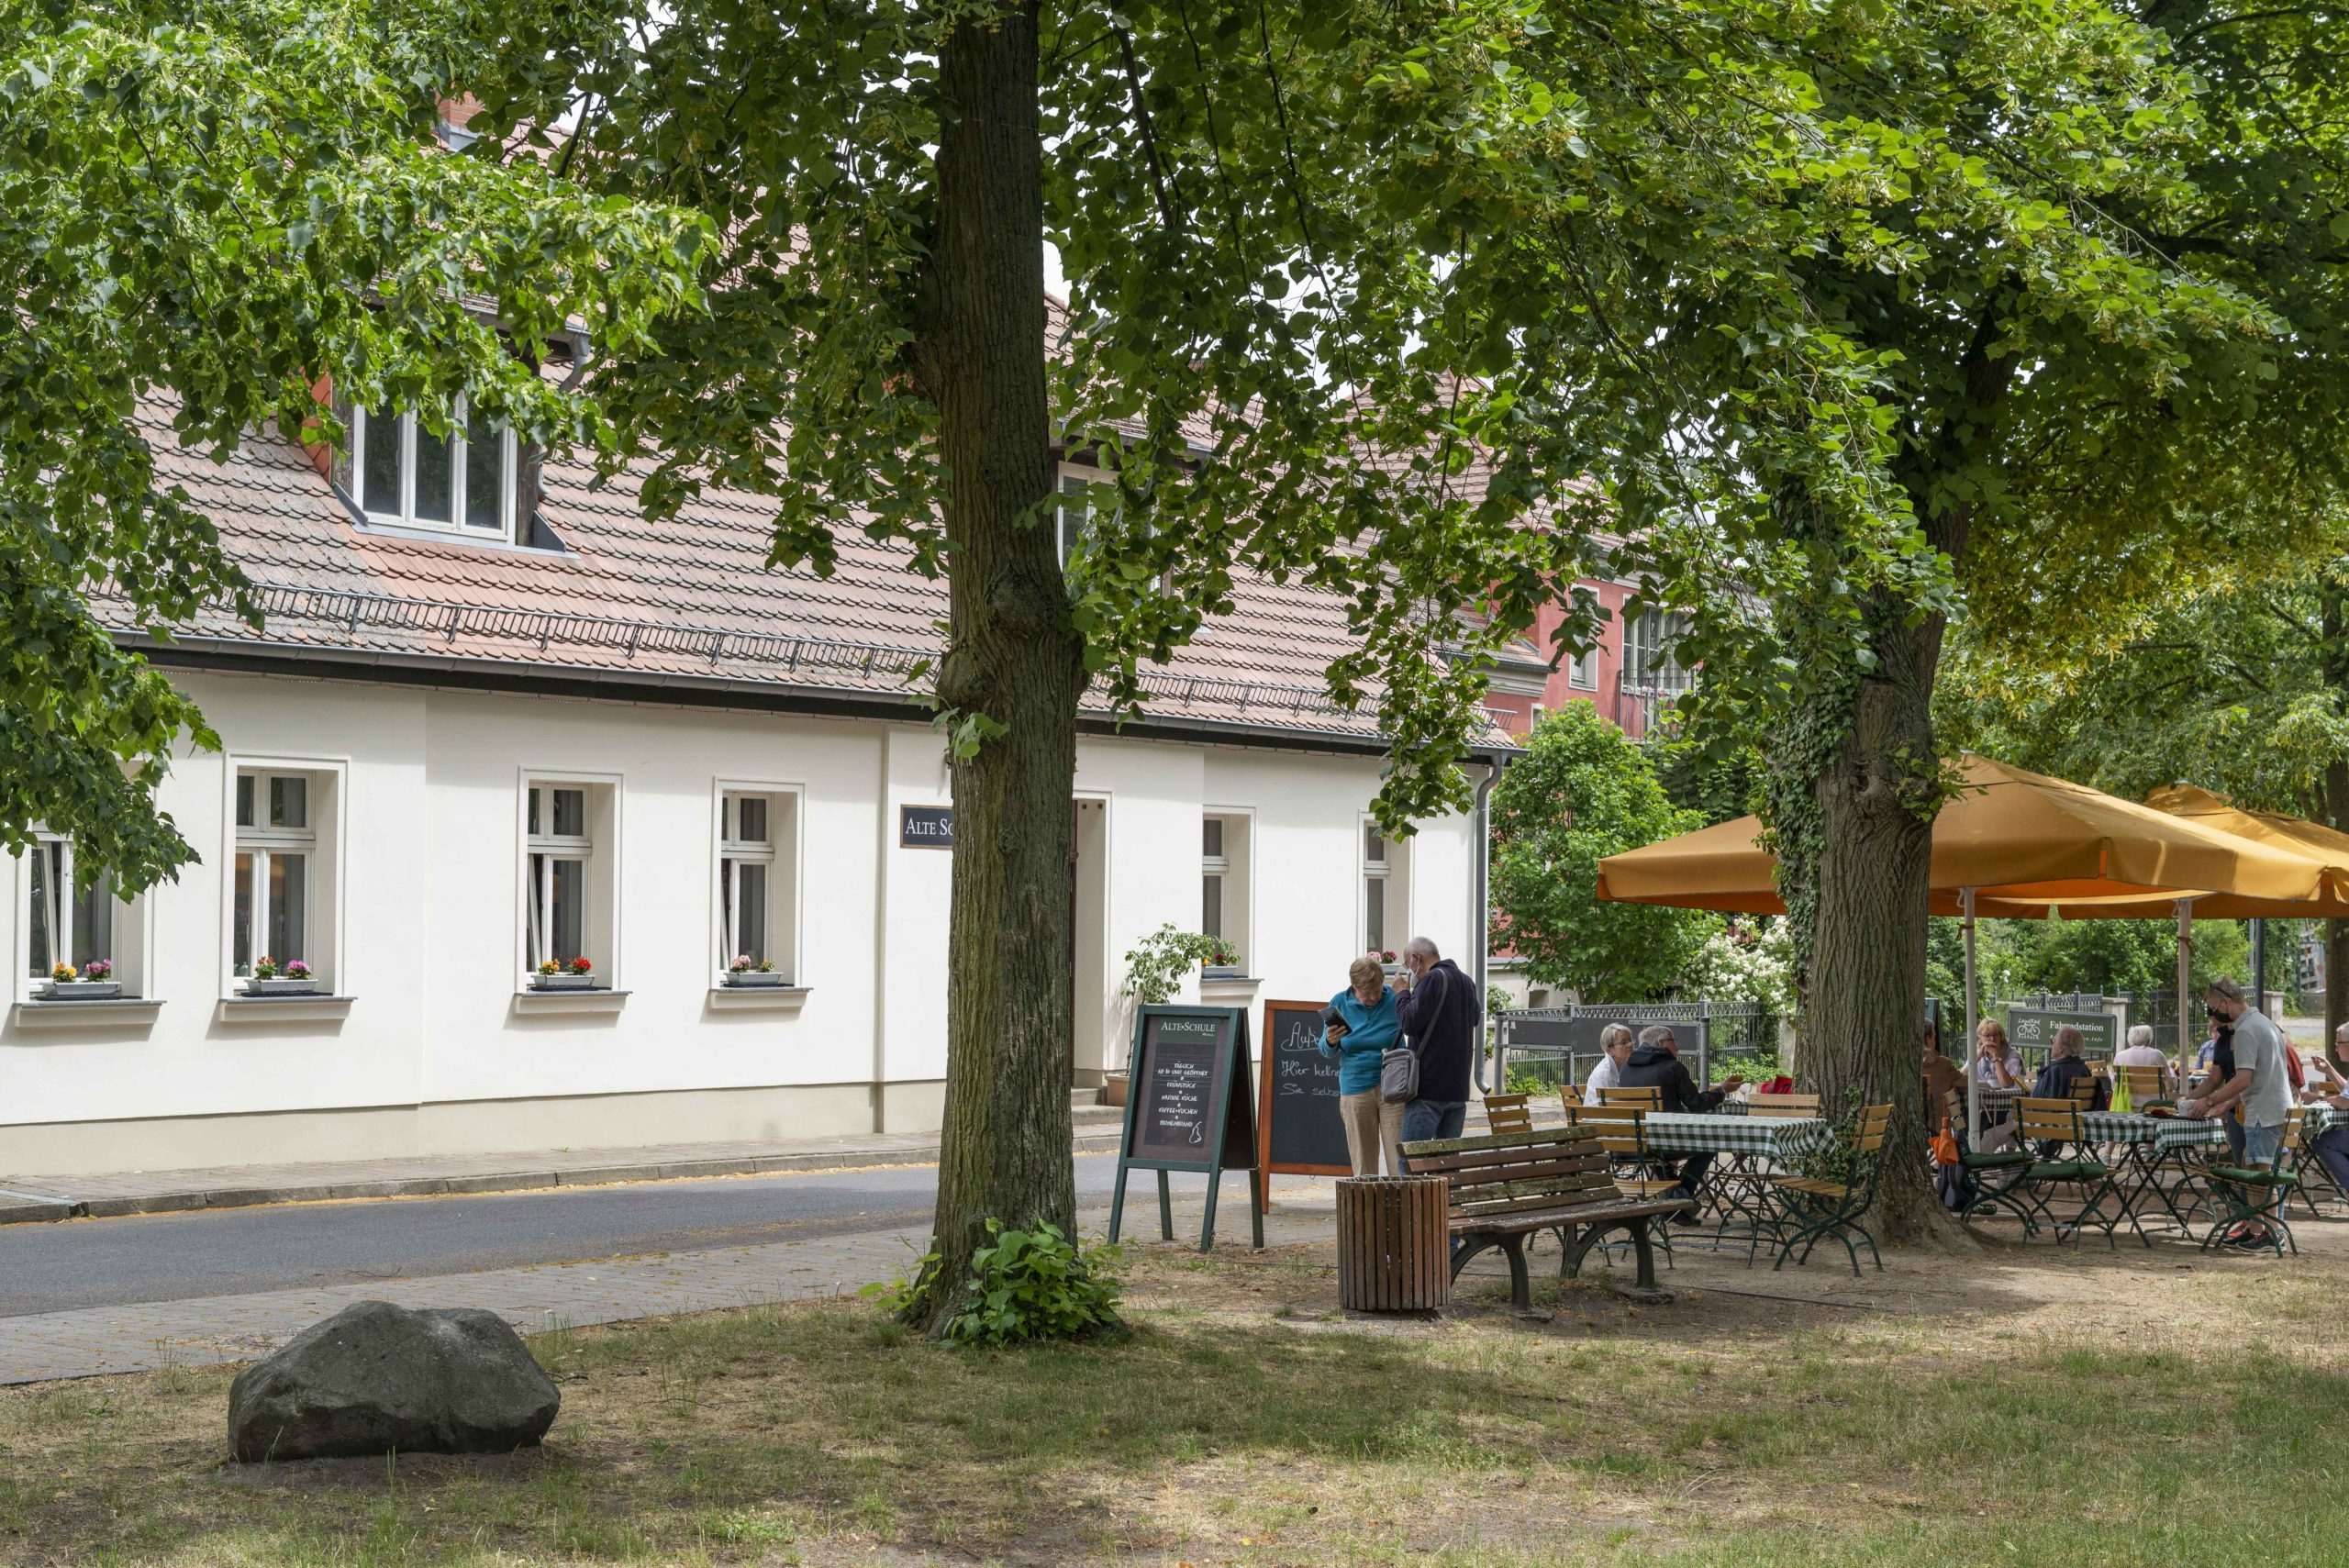 Alte Schule in Ribbeck